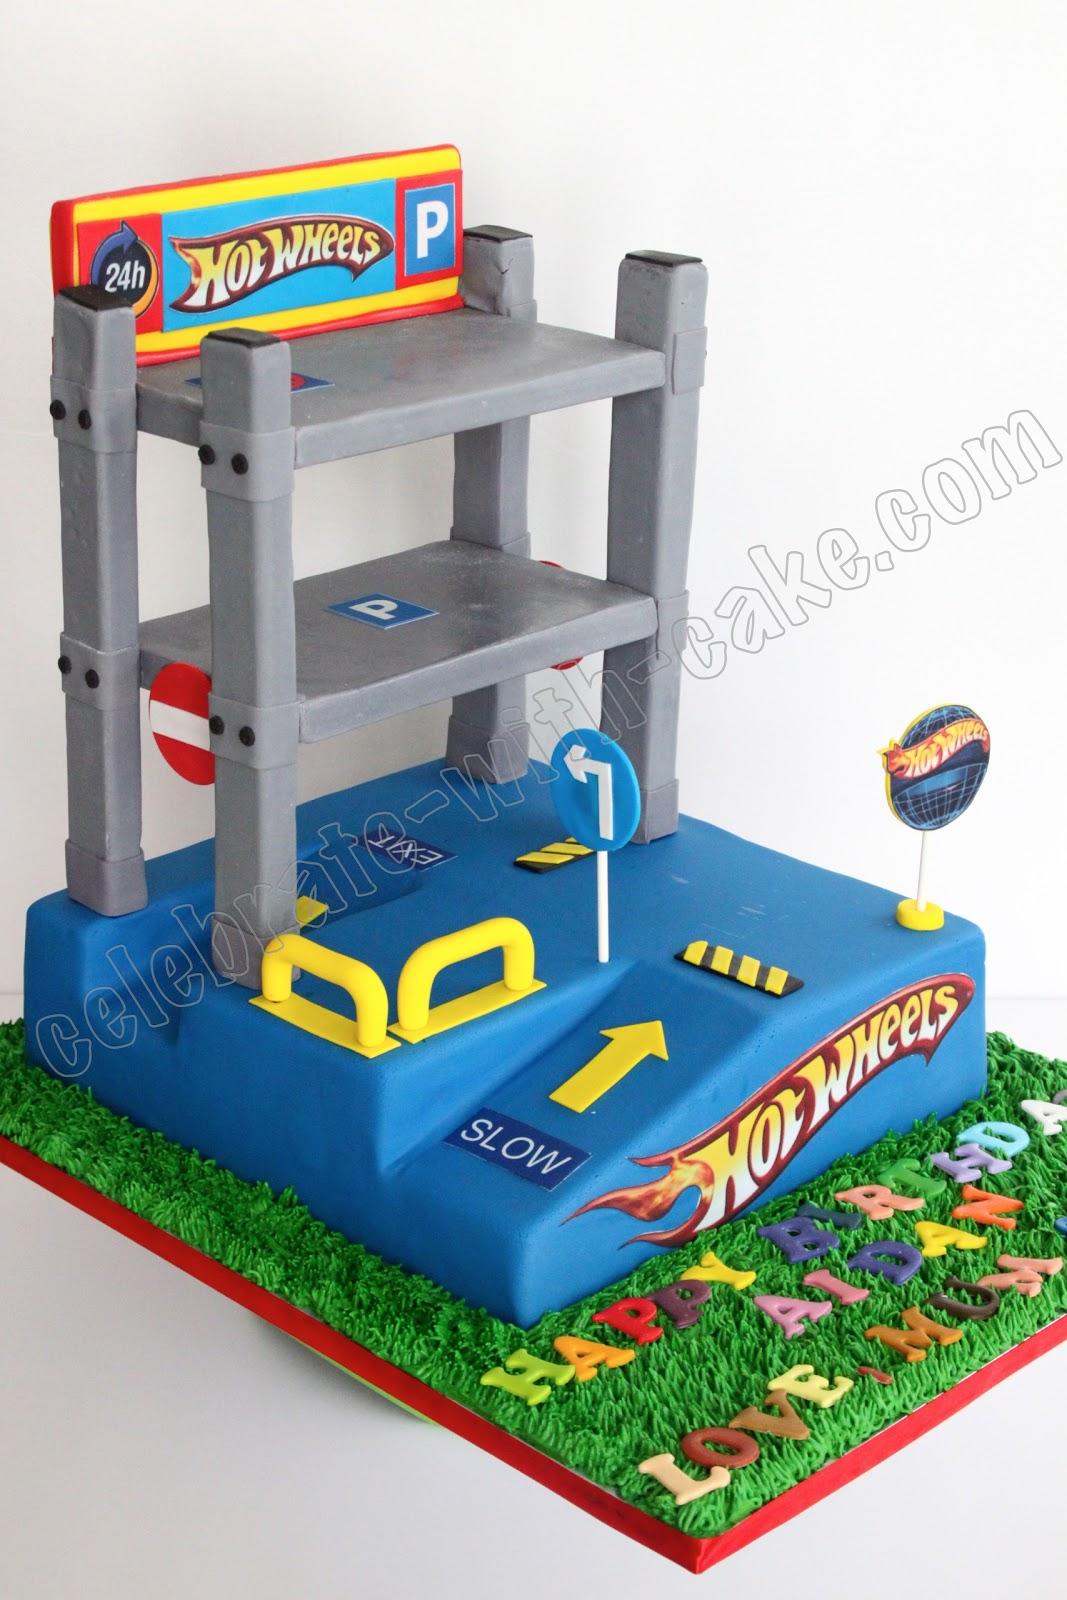 Celebrate with Cake!: Hot Wheels Garage Cake